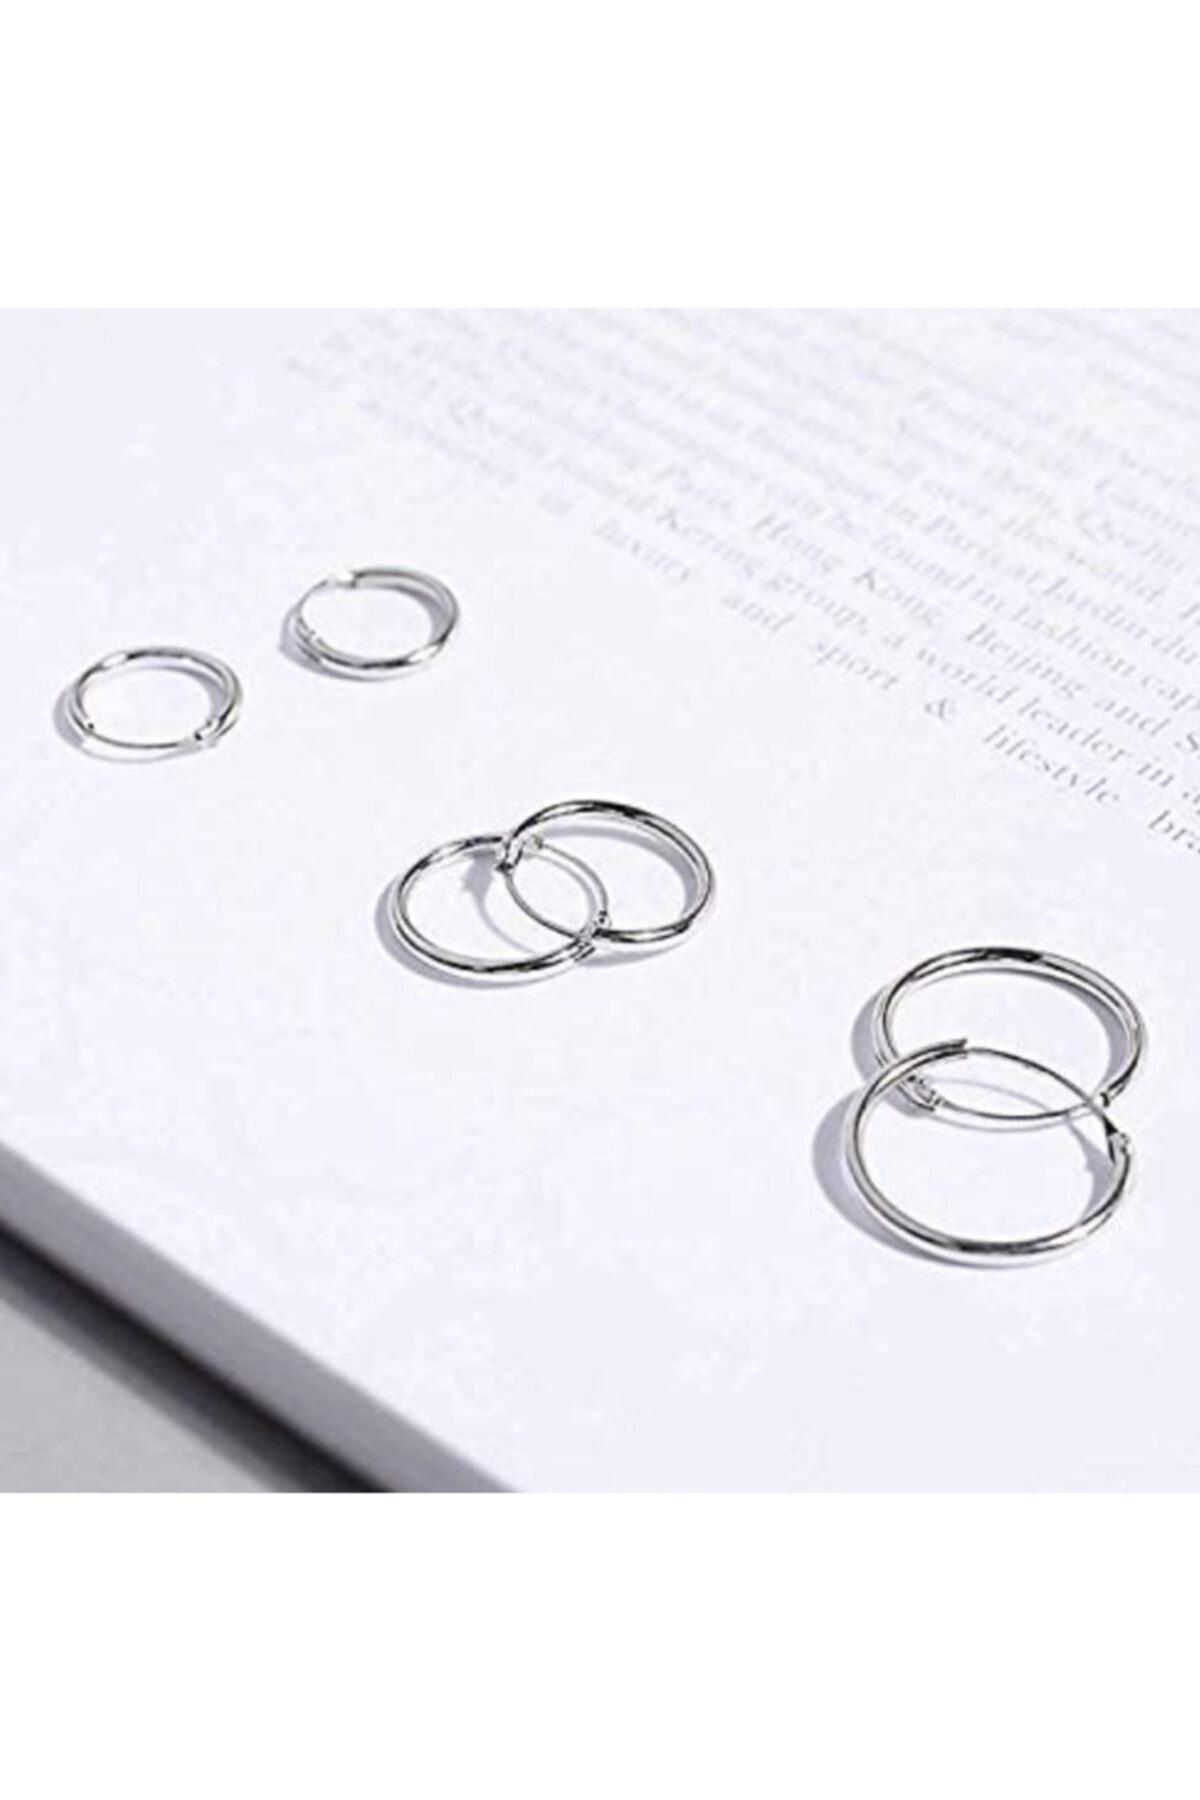 Onur Silver 925 Ayar Saf Gümüş Halka Küpe Seti 3'lü Hoop Earing Complete 12-14-16 Mm 2